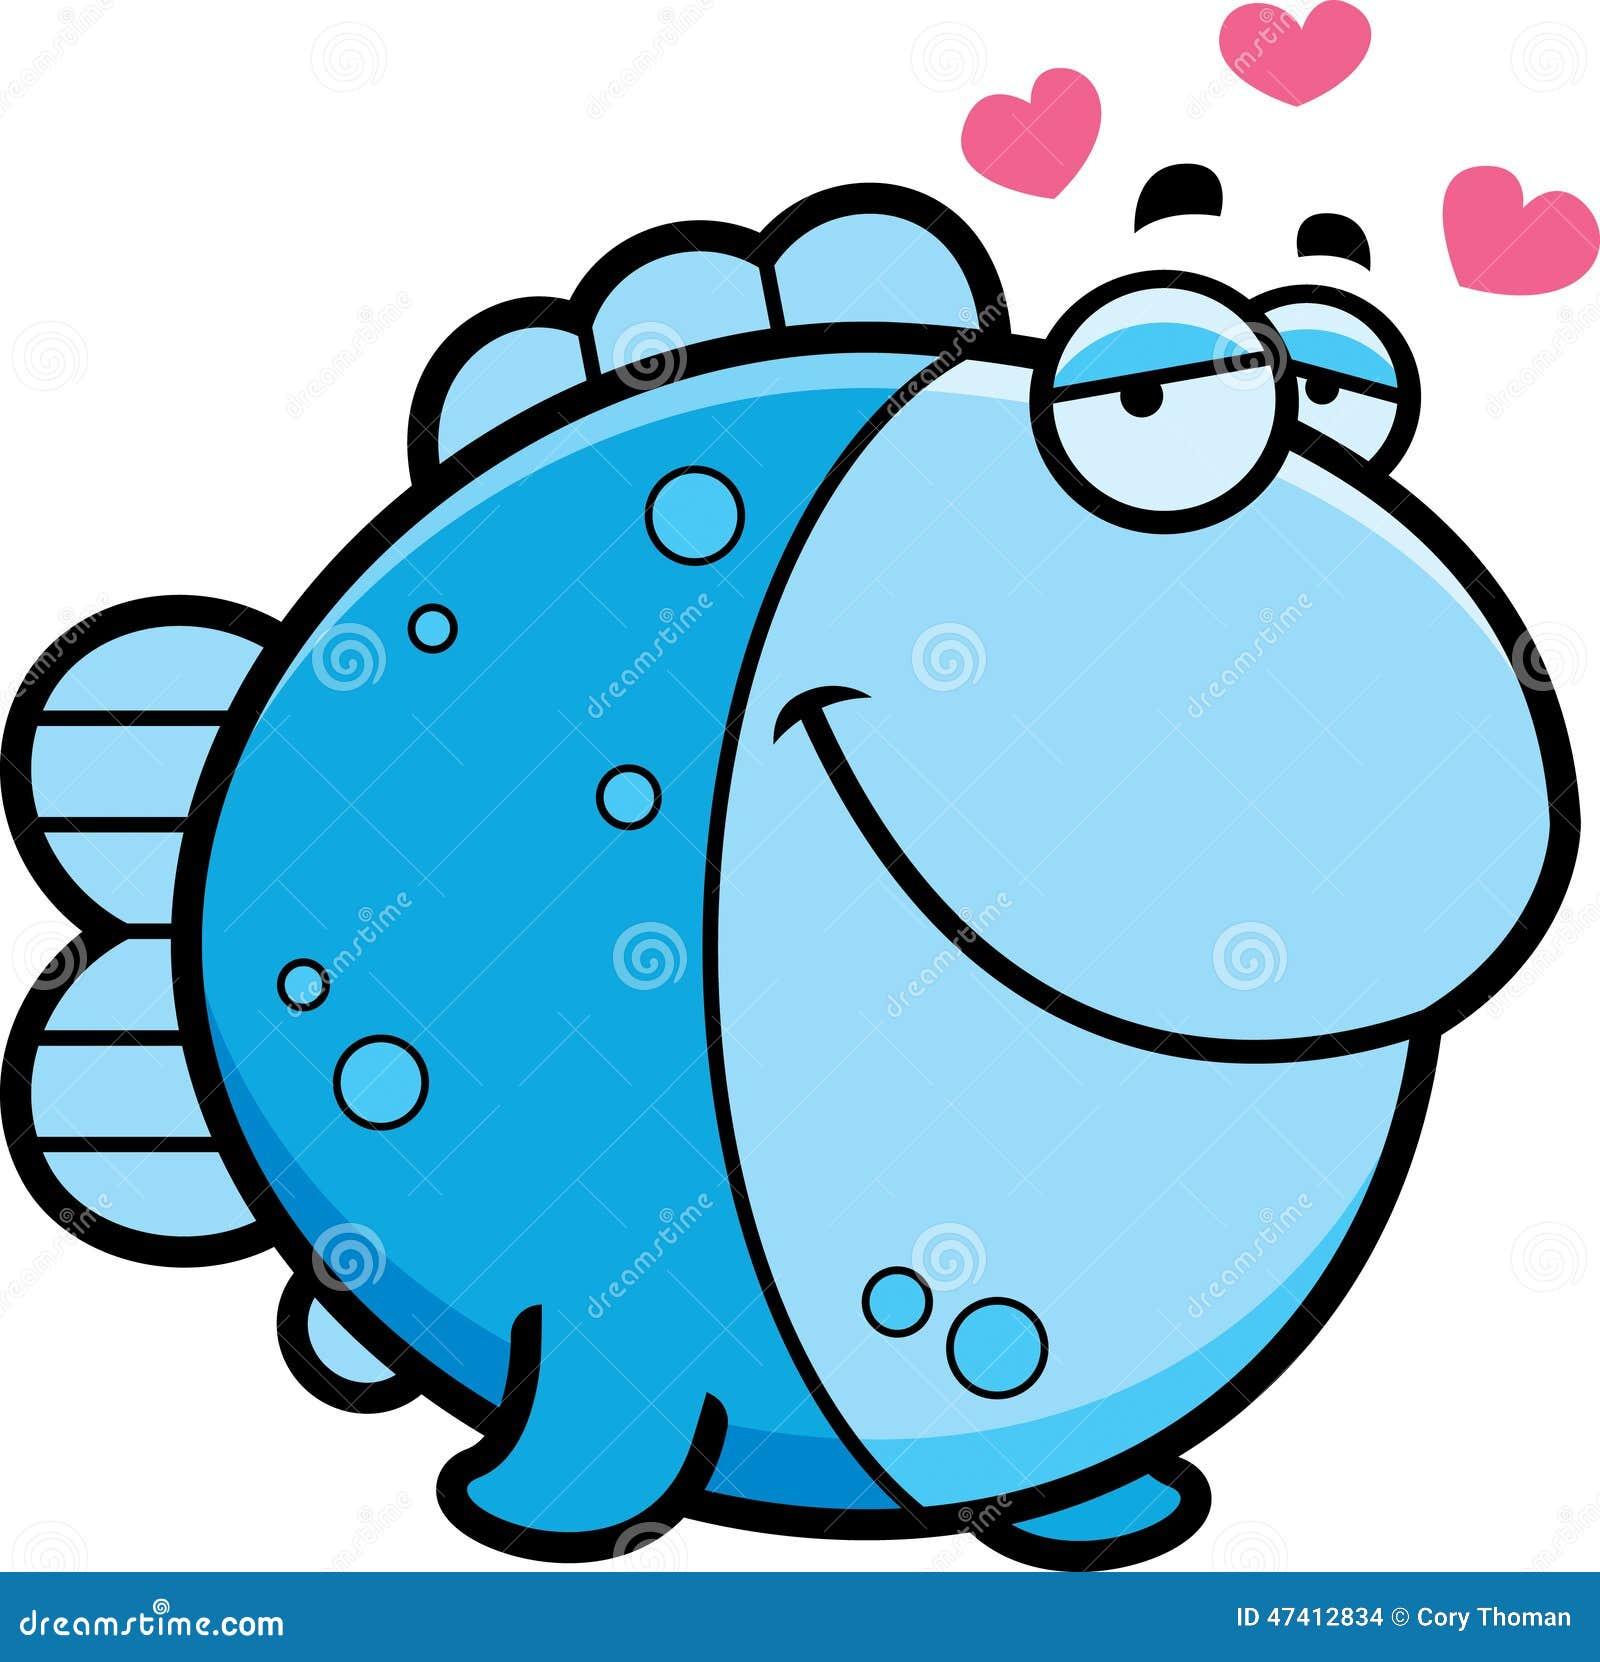 In Love Cartoon: Cartoon Fish In Love Stock Vector